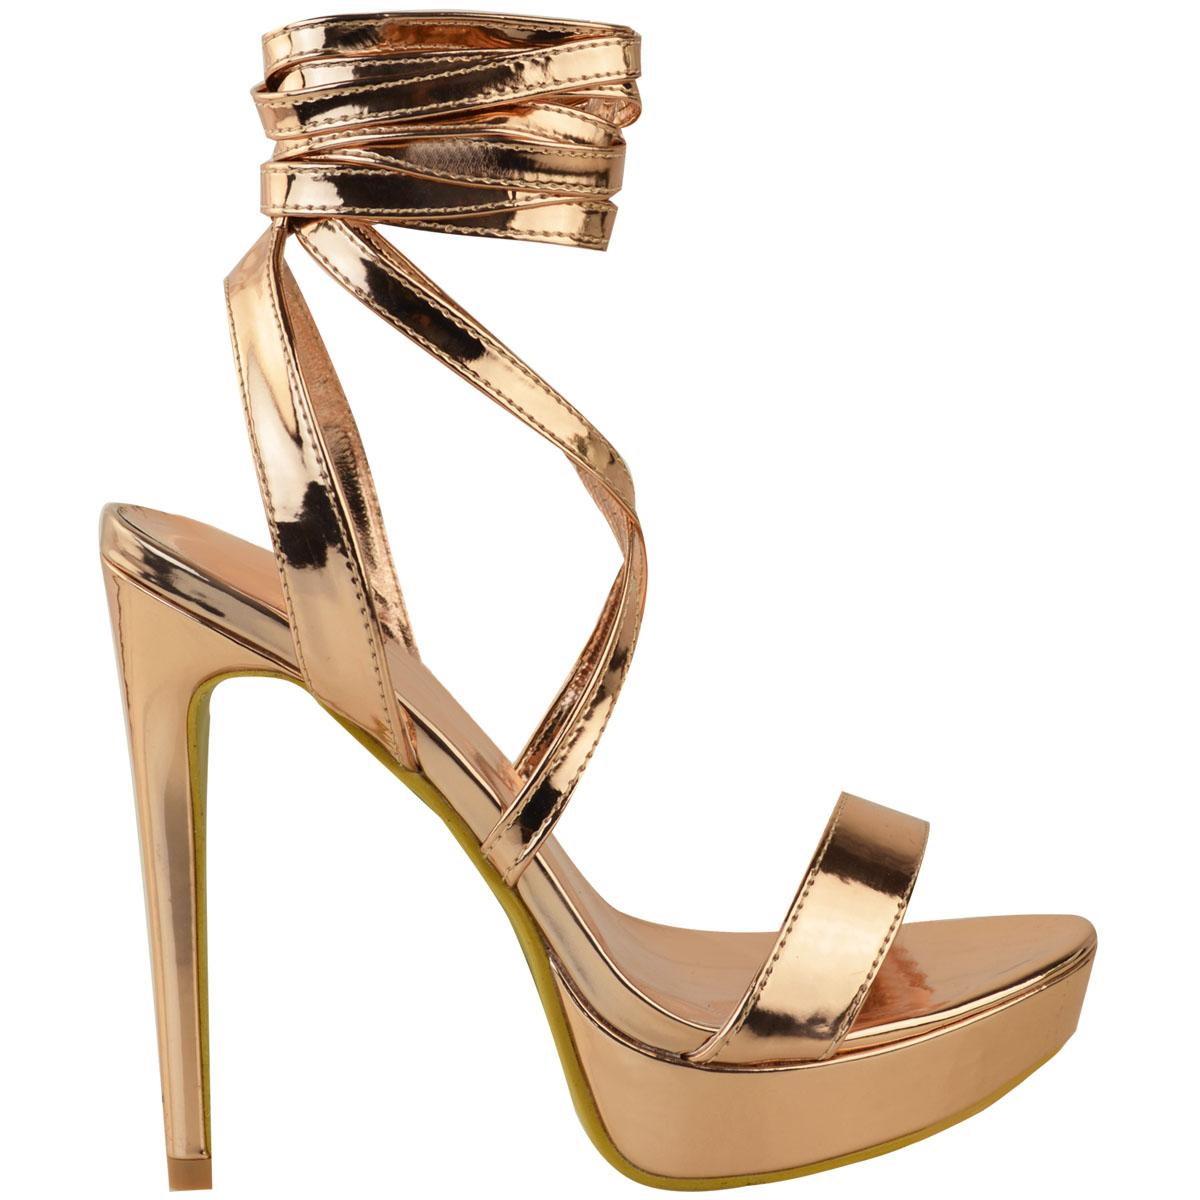 Womens-Ladies-Stilettos-High-Heels-Strappy-Platforms-Sandals-Diamante-Shoes-Size thumbnail 43